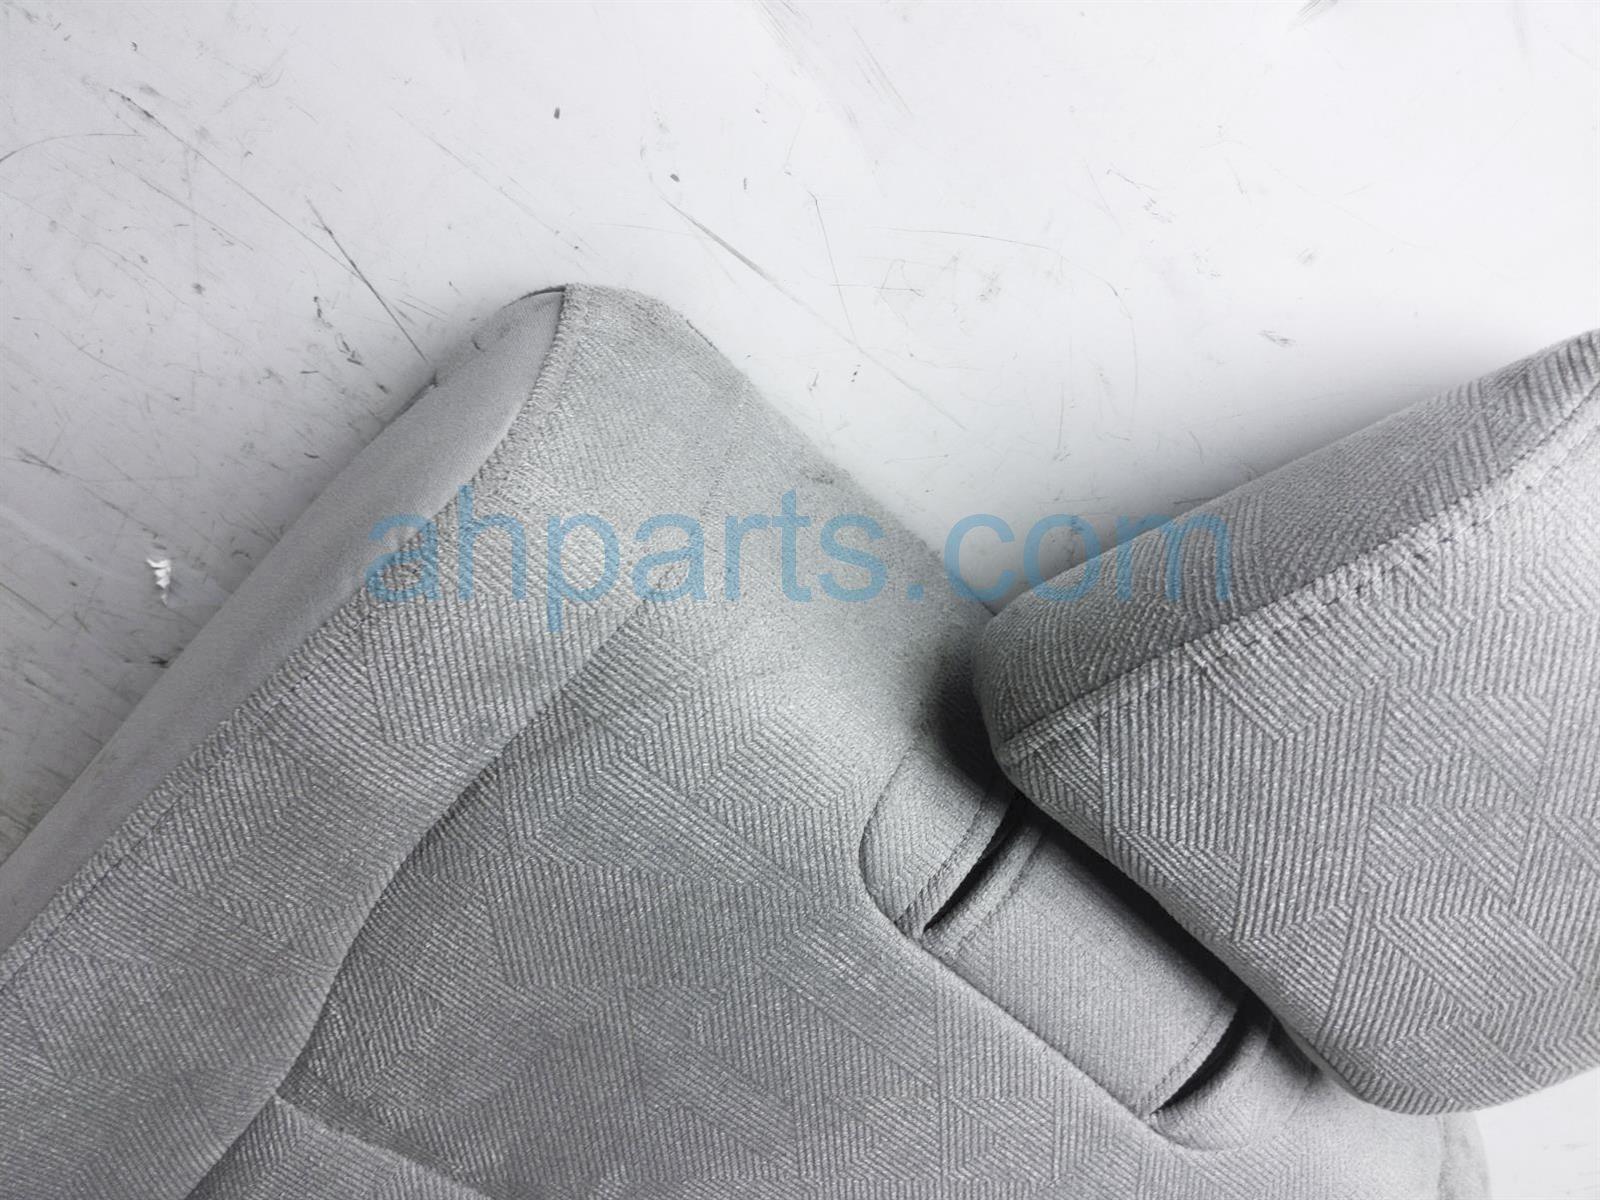 2019 Honda Pilot Rear / Back (3rd Row) 3rd Row Passenger Seat Upper Portion   Gray 82121 TG7 L01ZC Replacement